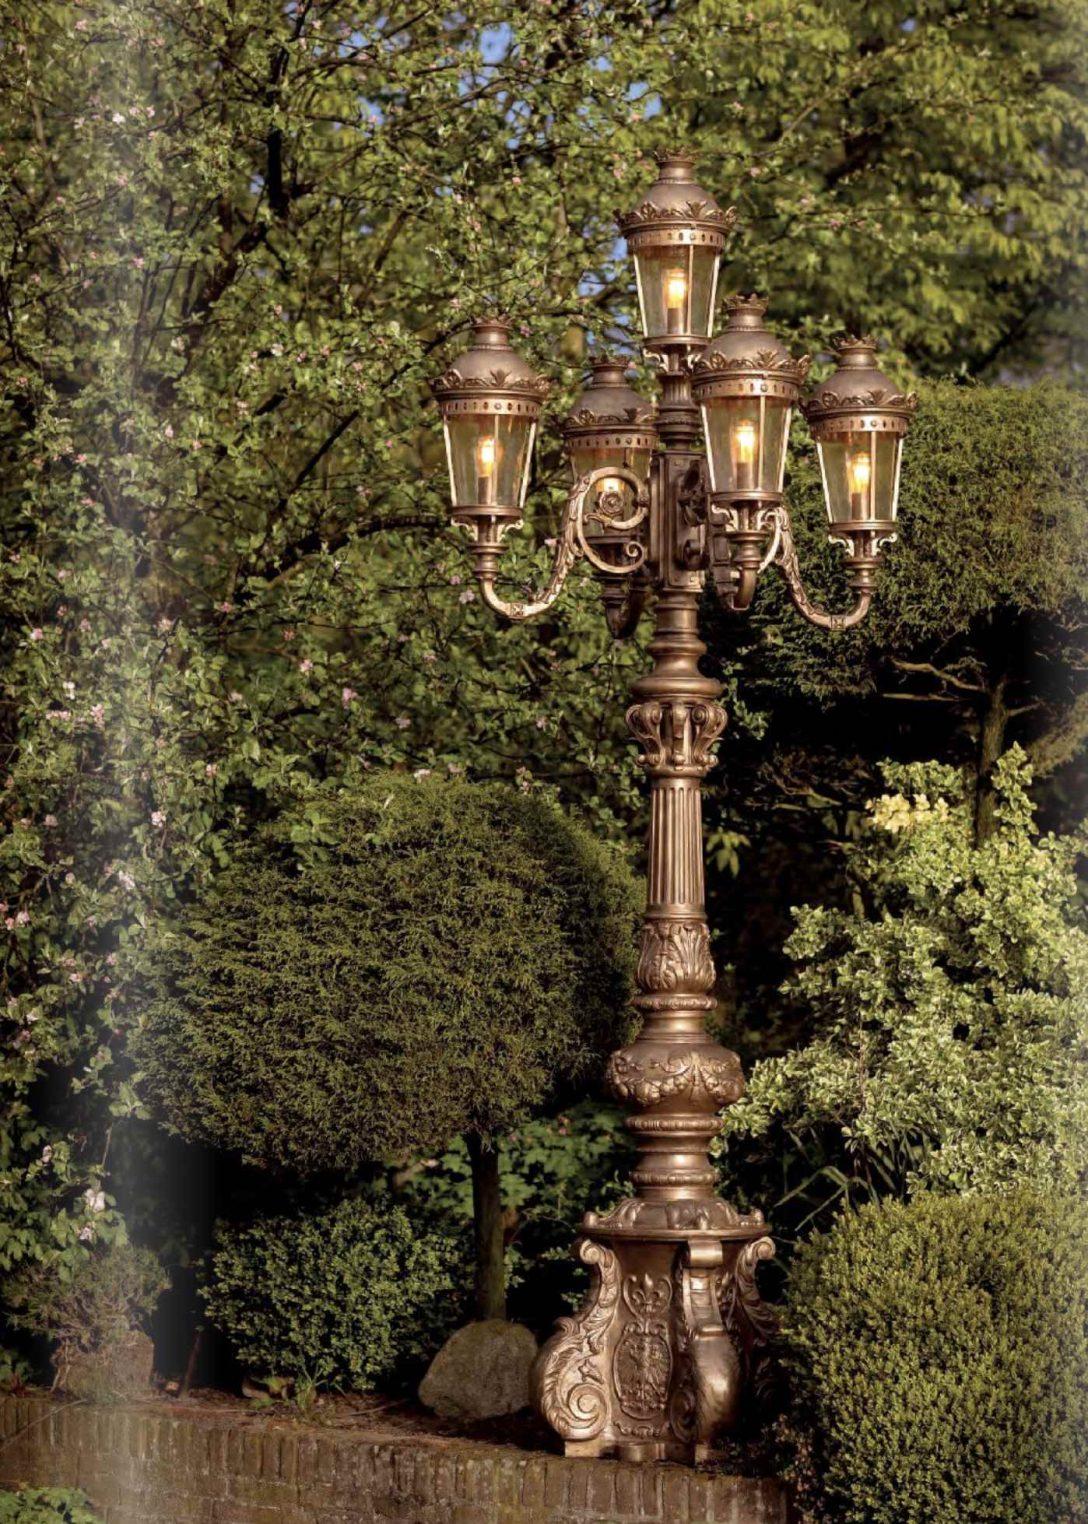 Large Size of Kandelaber Garten Gartenlampe Gartenleuchte Kandelaber Garten Ehrenpreis Fascination Laterne Ebay Antik Gartenlampen 5 Armige Luxus Mit Imposanten Anblick Garten Kandelaber Garten